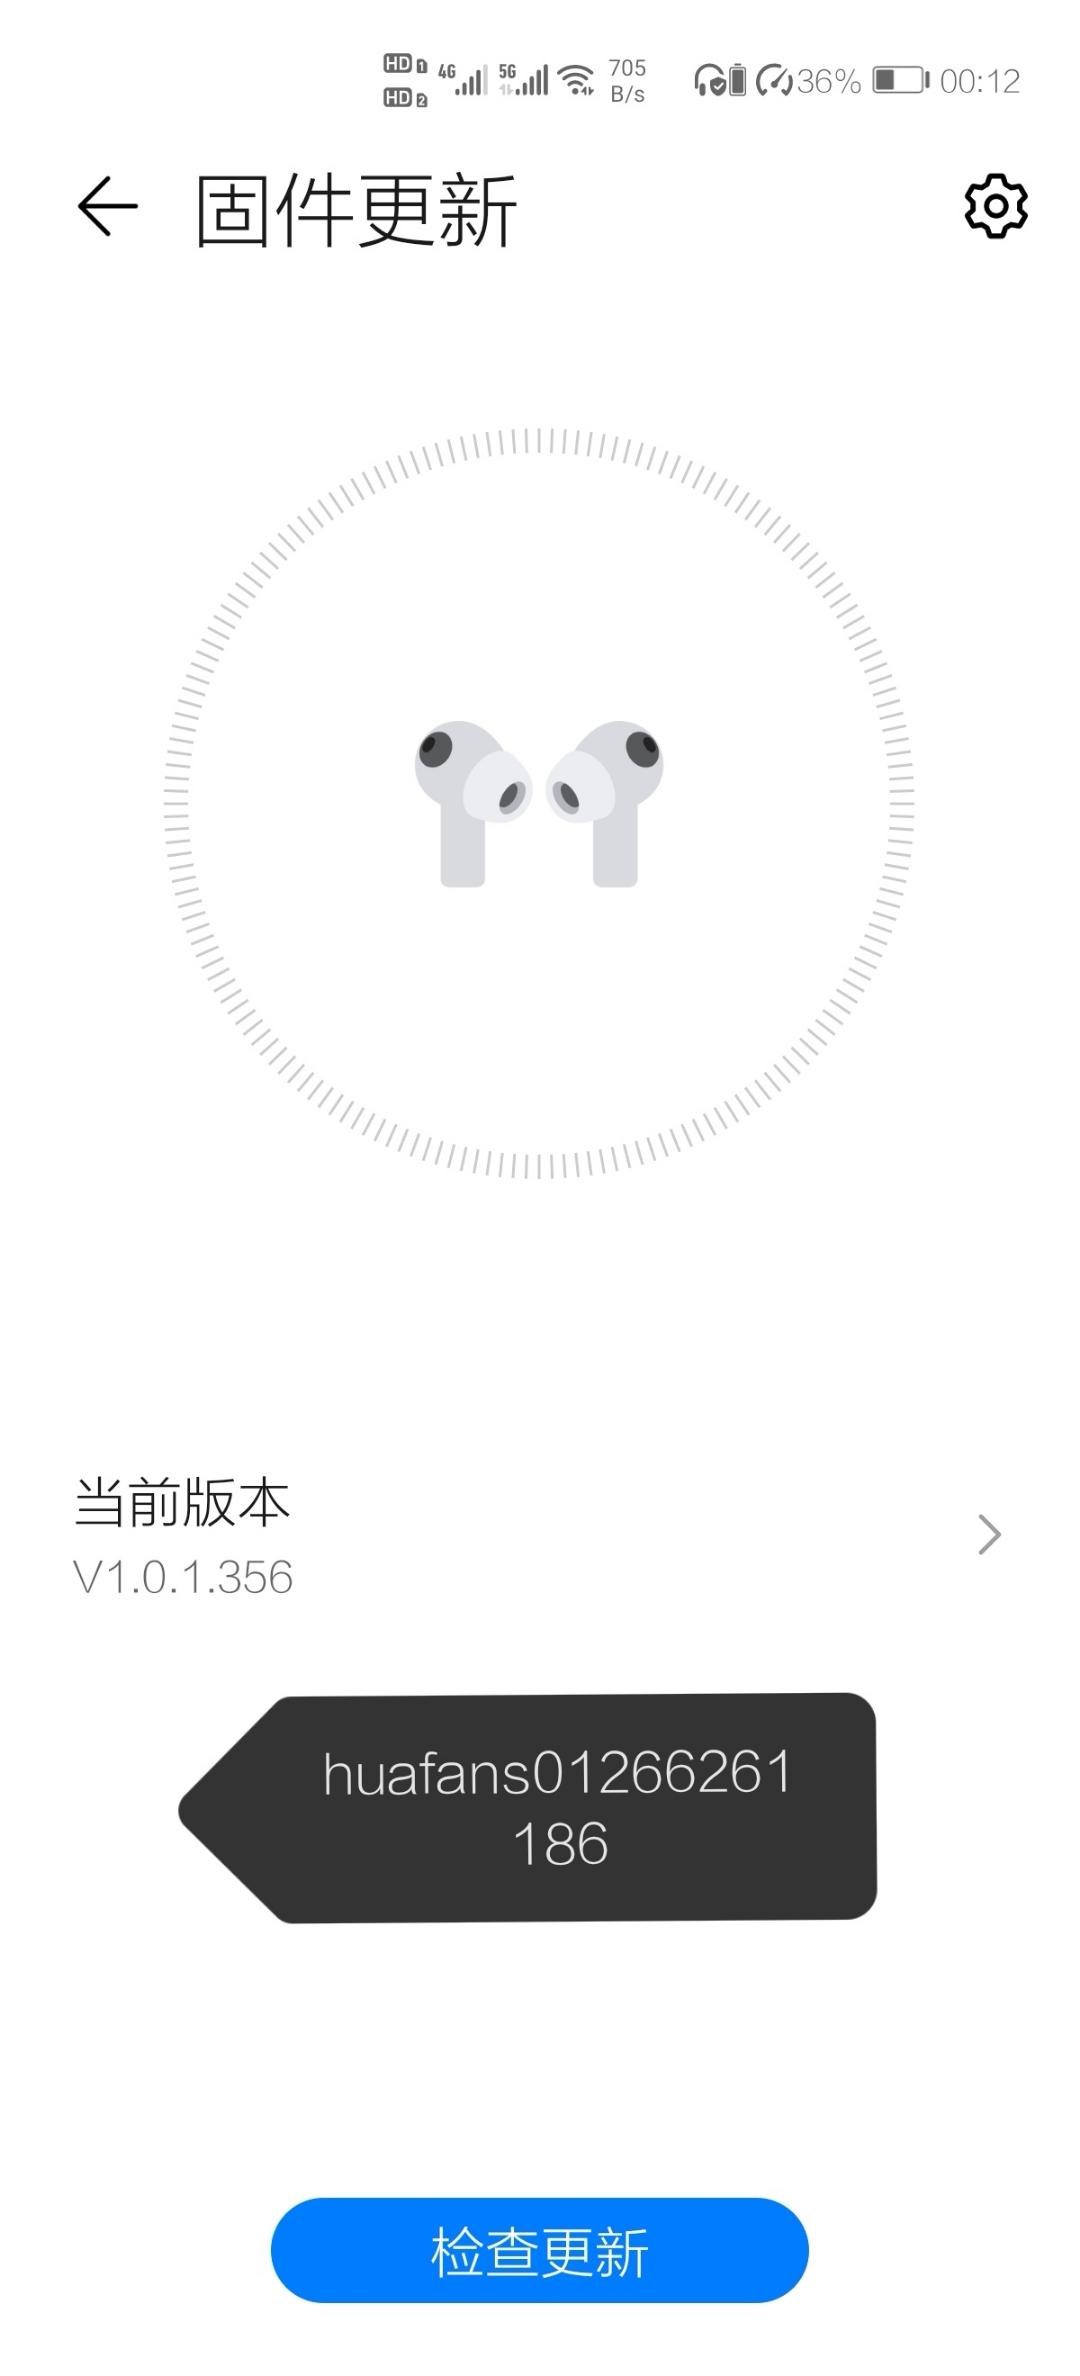 Screenshot_20210403_001200_com.huawei.smarthome_edit_929239270348309.jpg